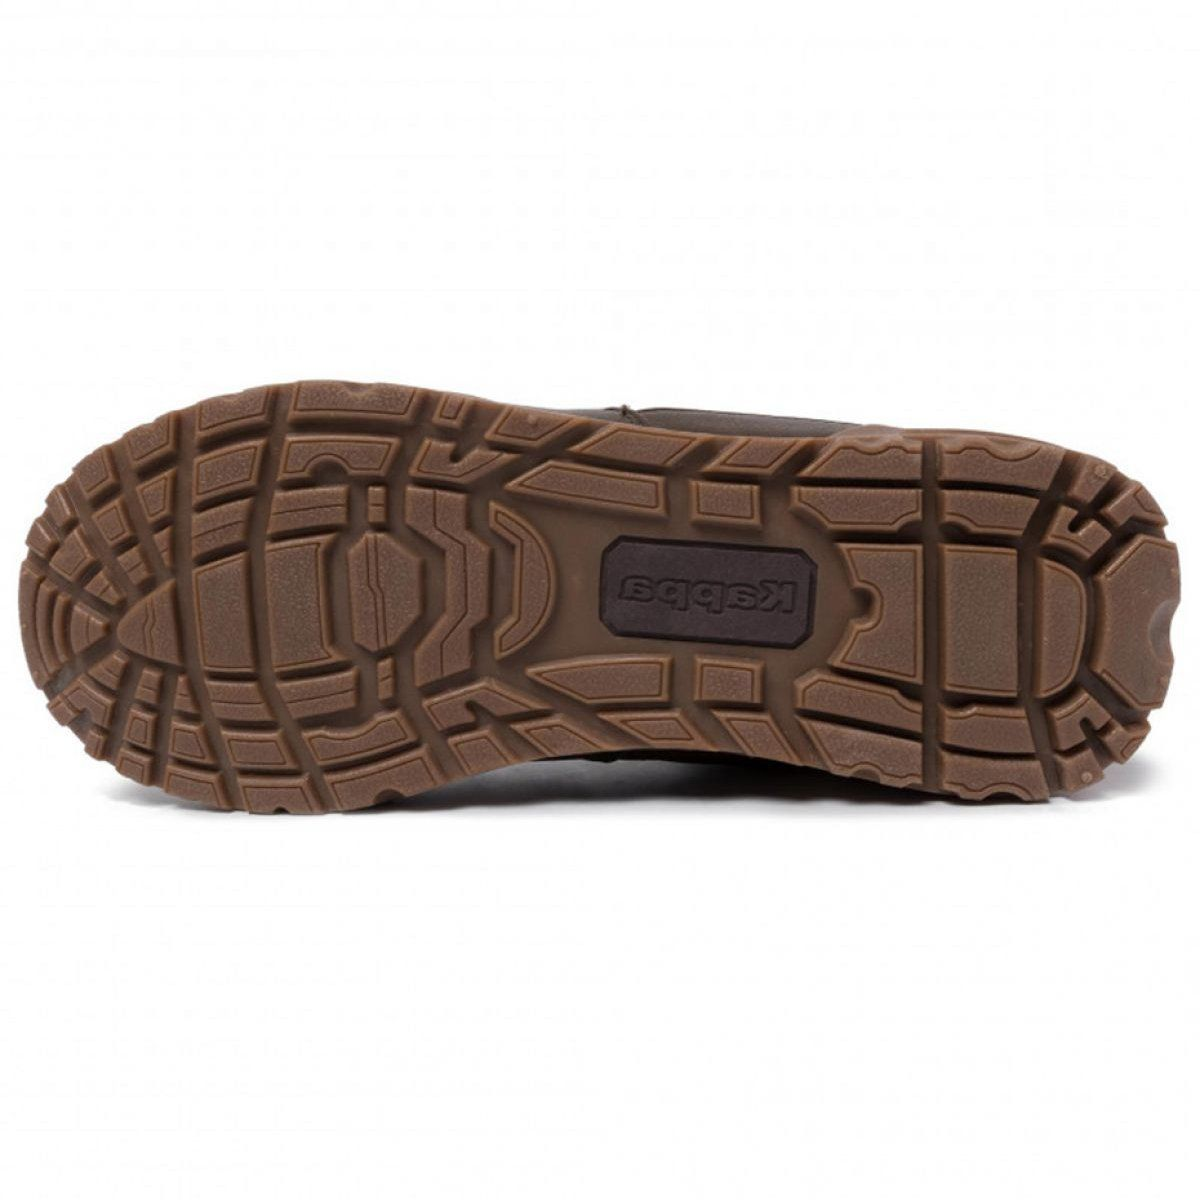 Buty Zimowe Kappa Bonfire M 242777 5050 Brazowe Winter Shoes Sport Shoes Men Shoes Mens